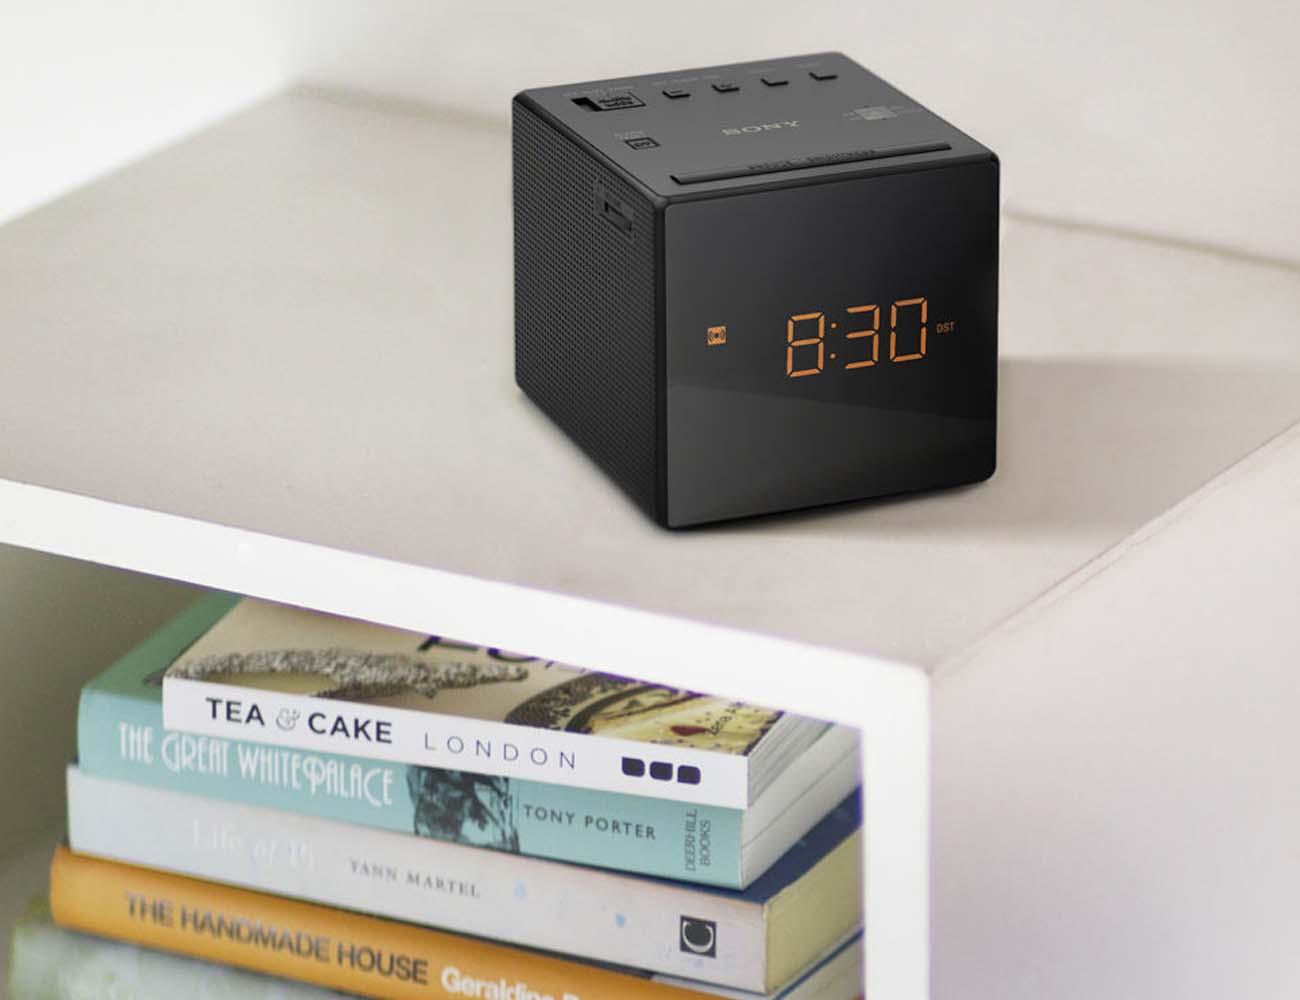 Sony+ICFC1+Alarm+Clock+Radio